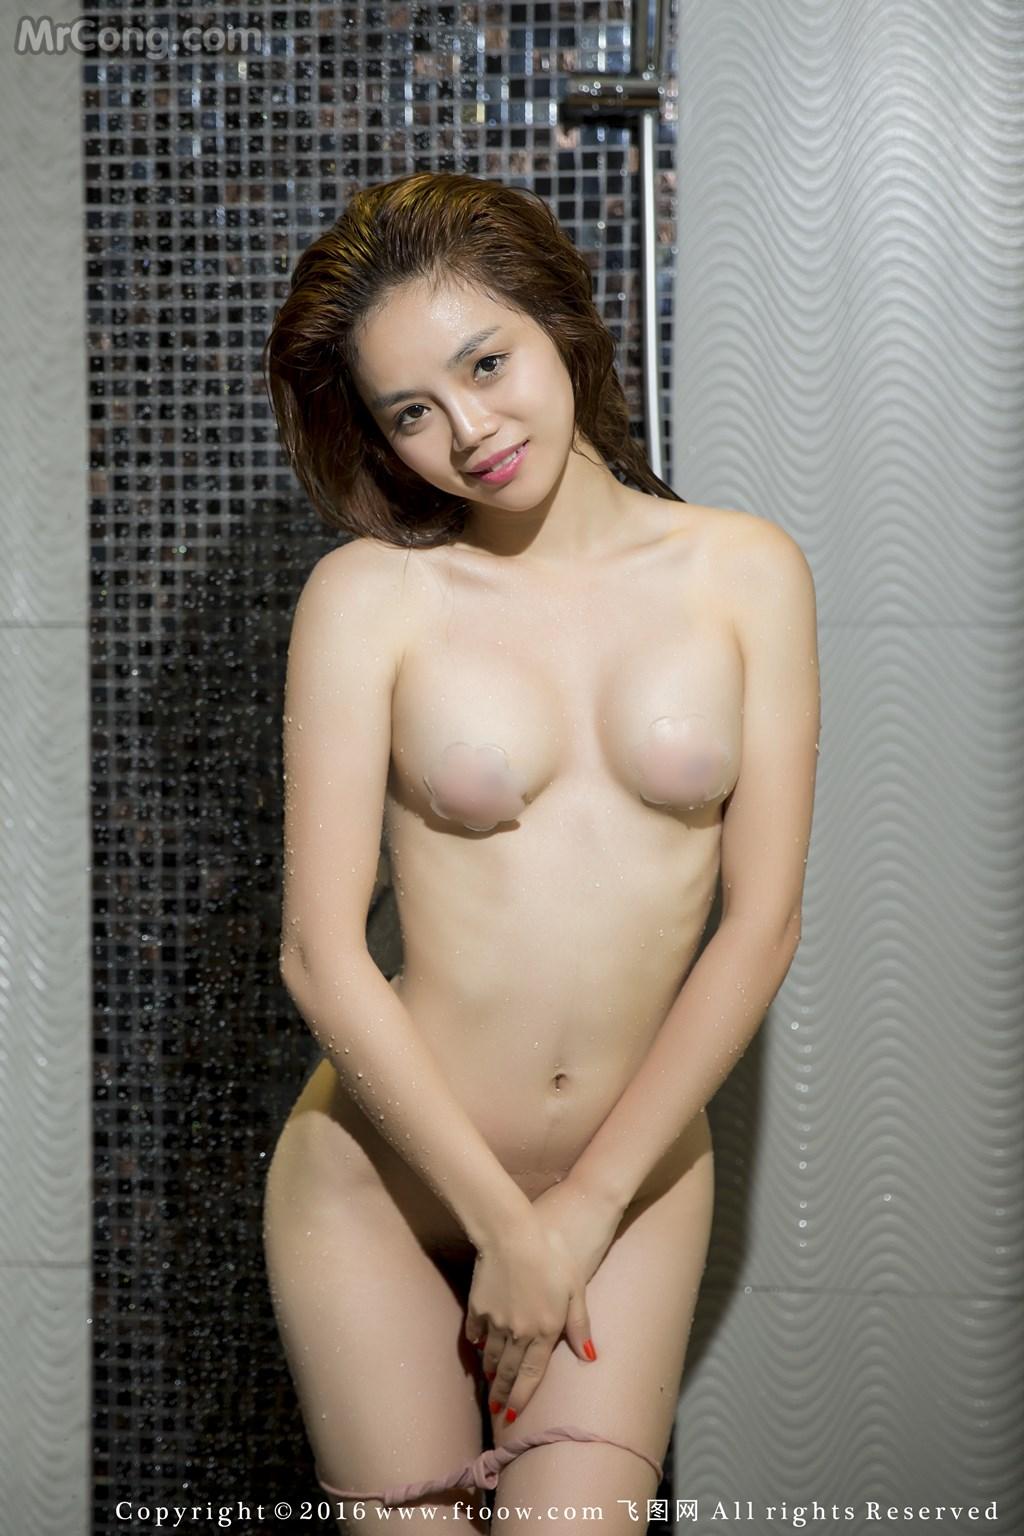 FToow No.011: Người mẫu Meng Yao (Babyface梦瑶) (53 ảnh)